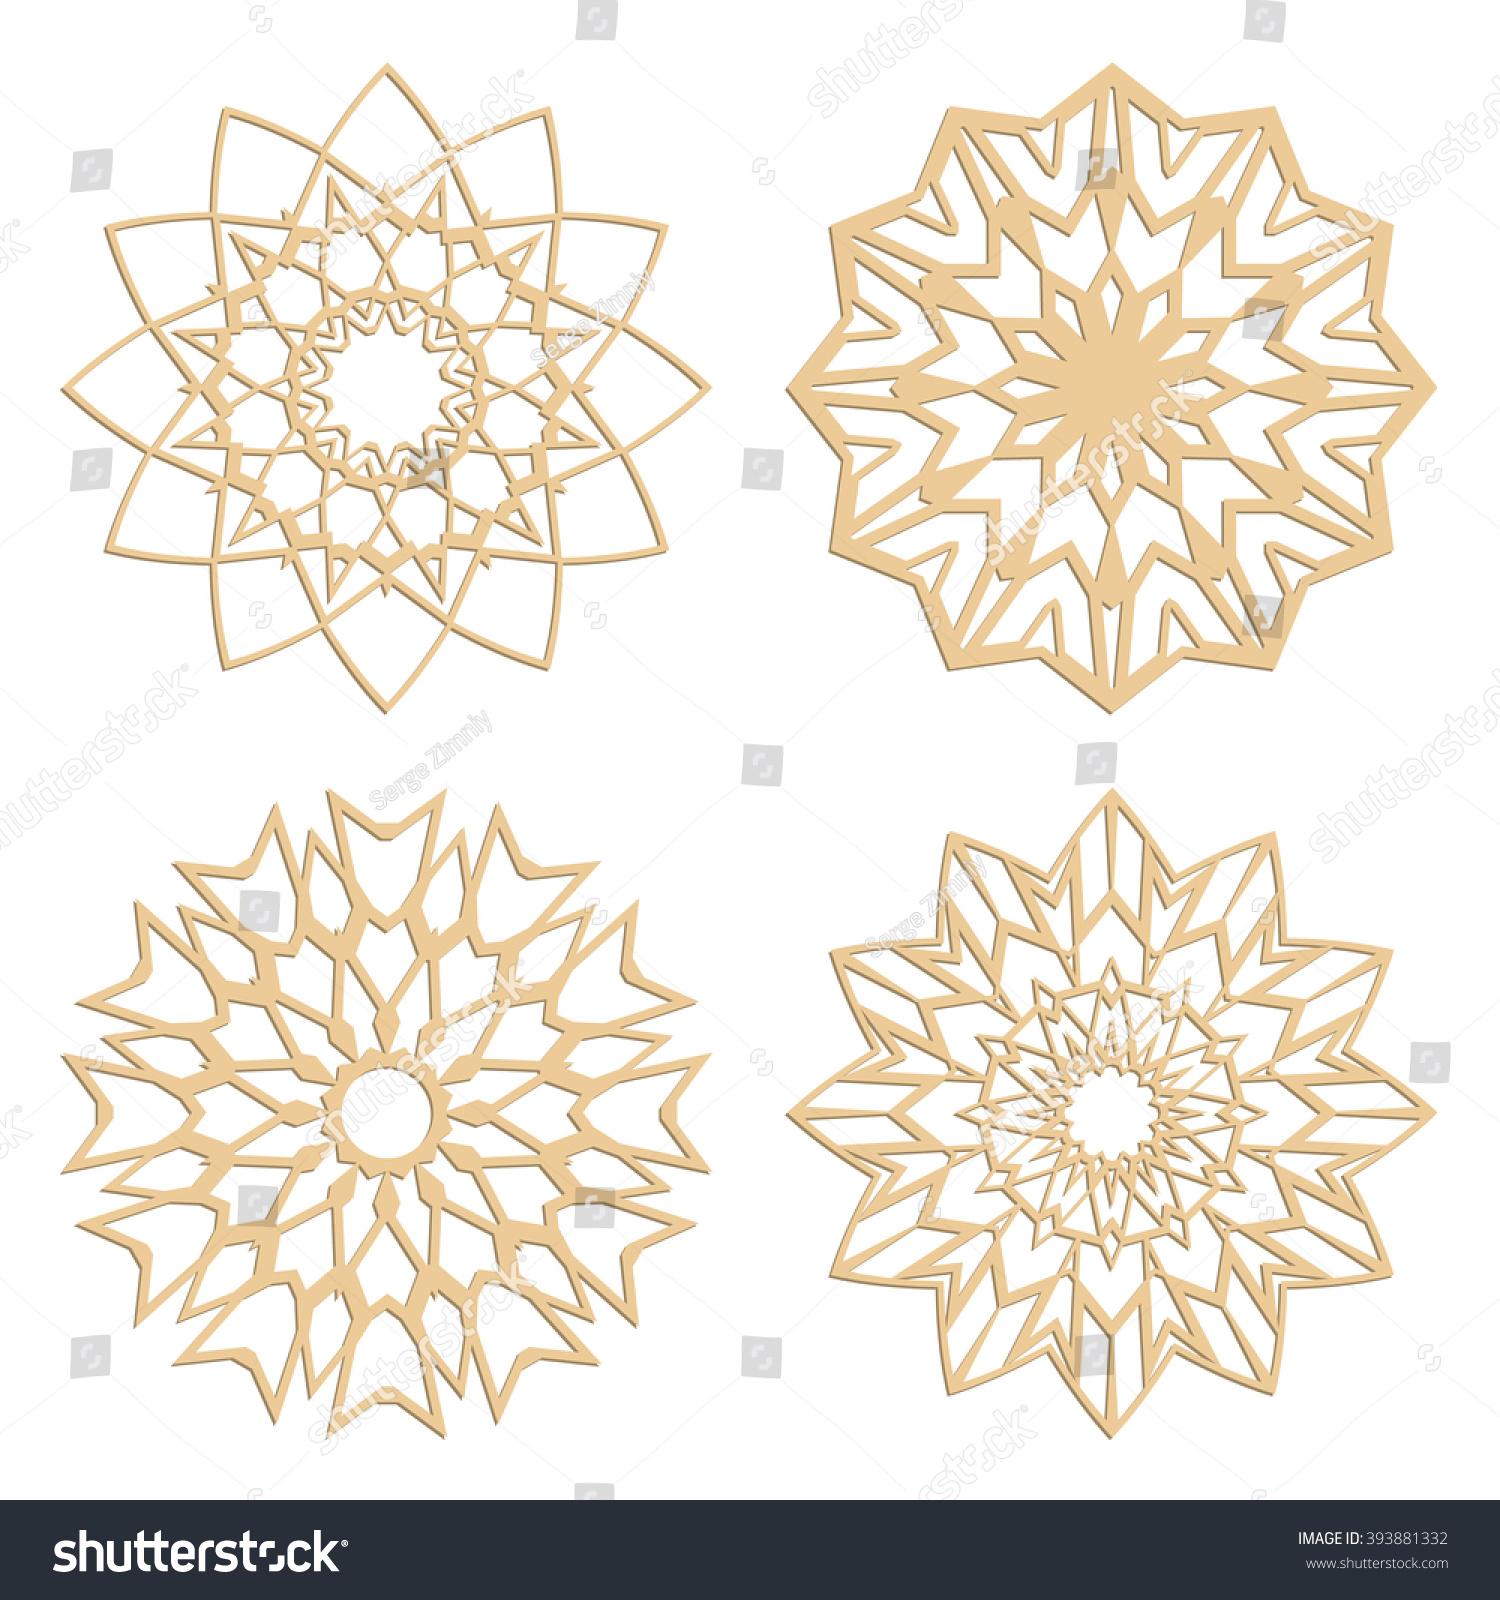 diy laser cutting patterns islamic die stock vector 393881332